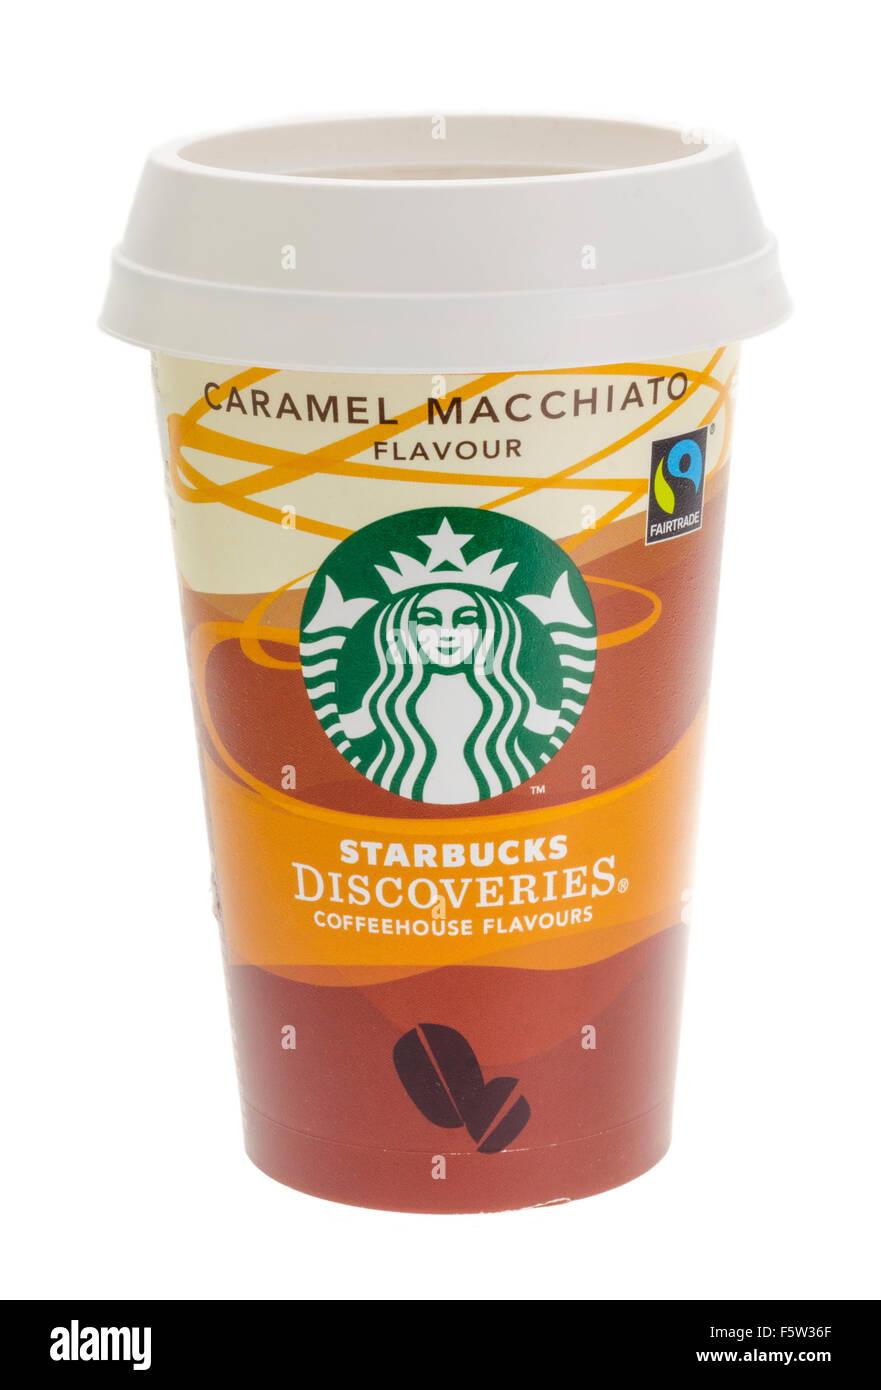 Starbucks Discoveries Take Away Coffee - Stock Image